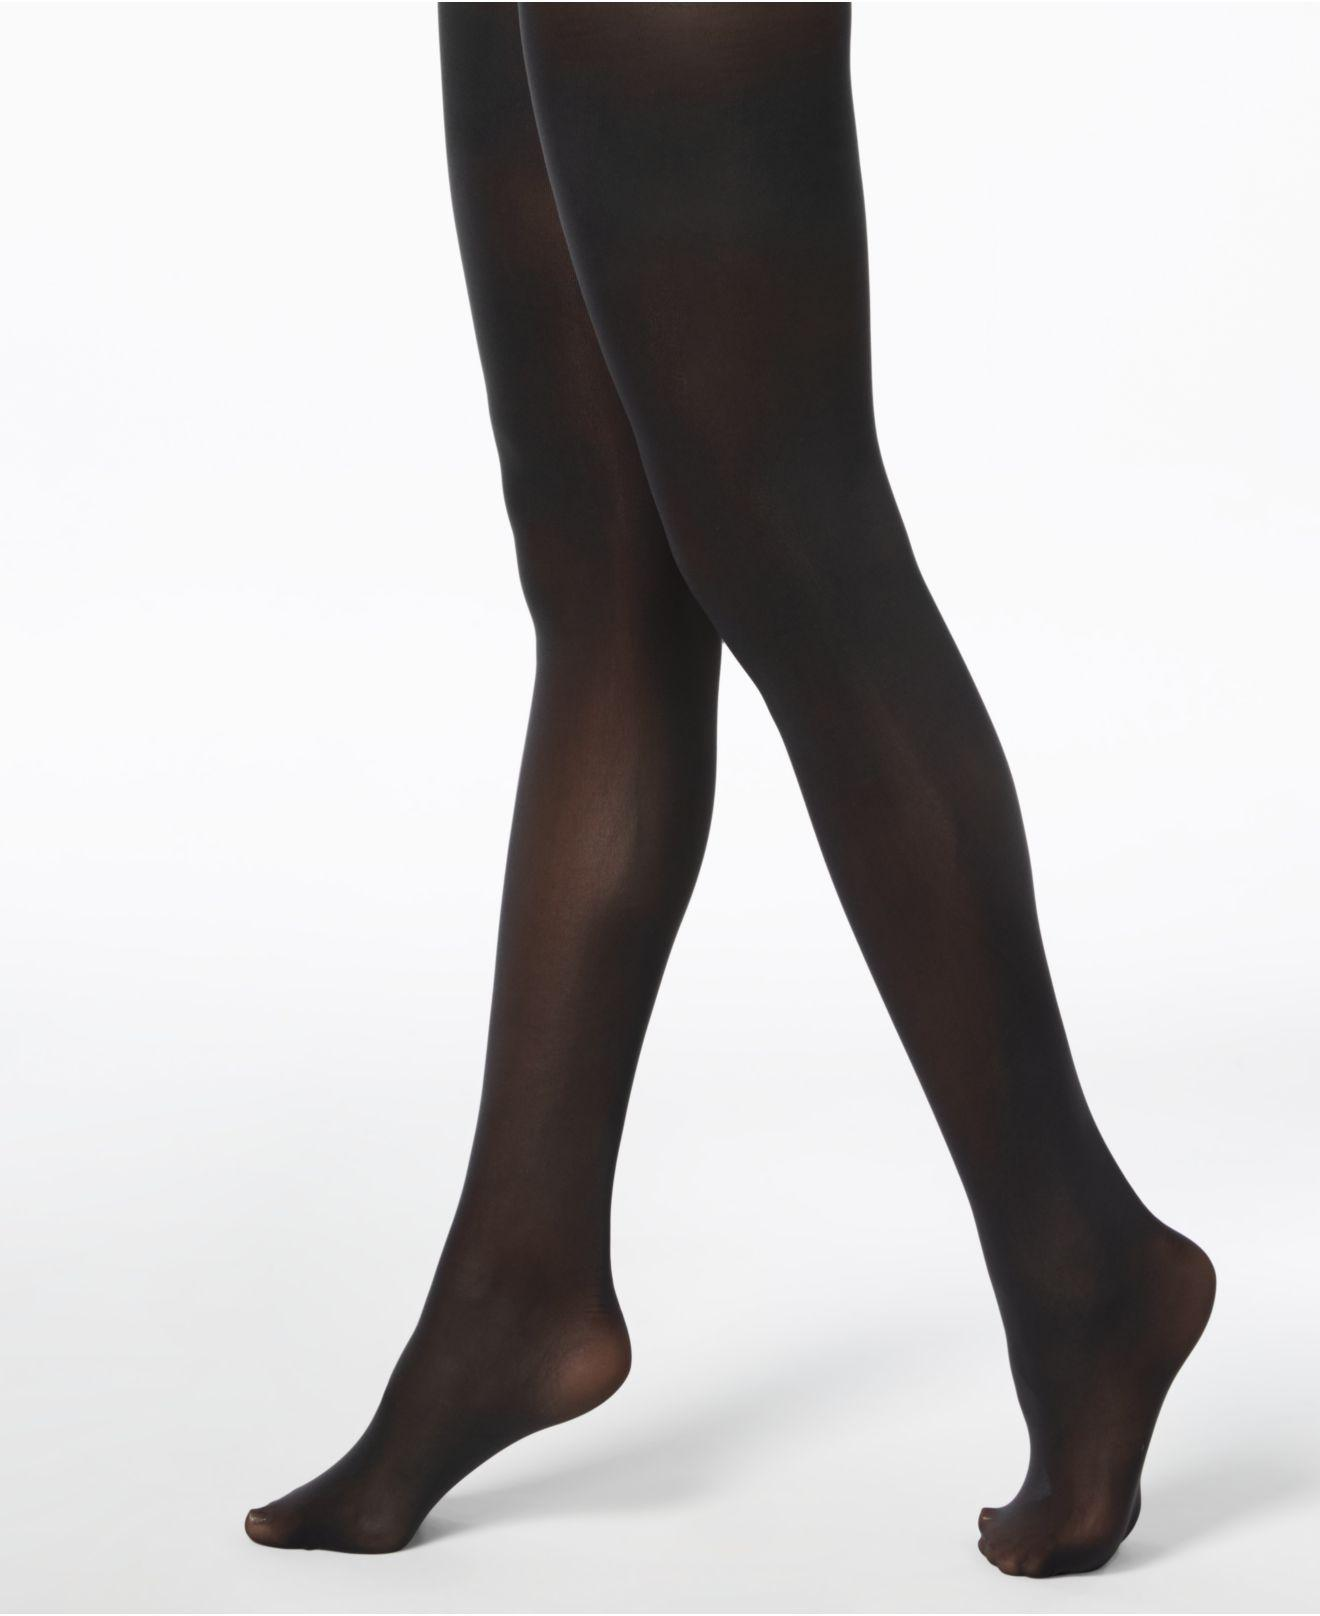 INC International Concepts Tights Striped Mock Thigh-High Tights